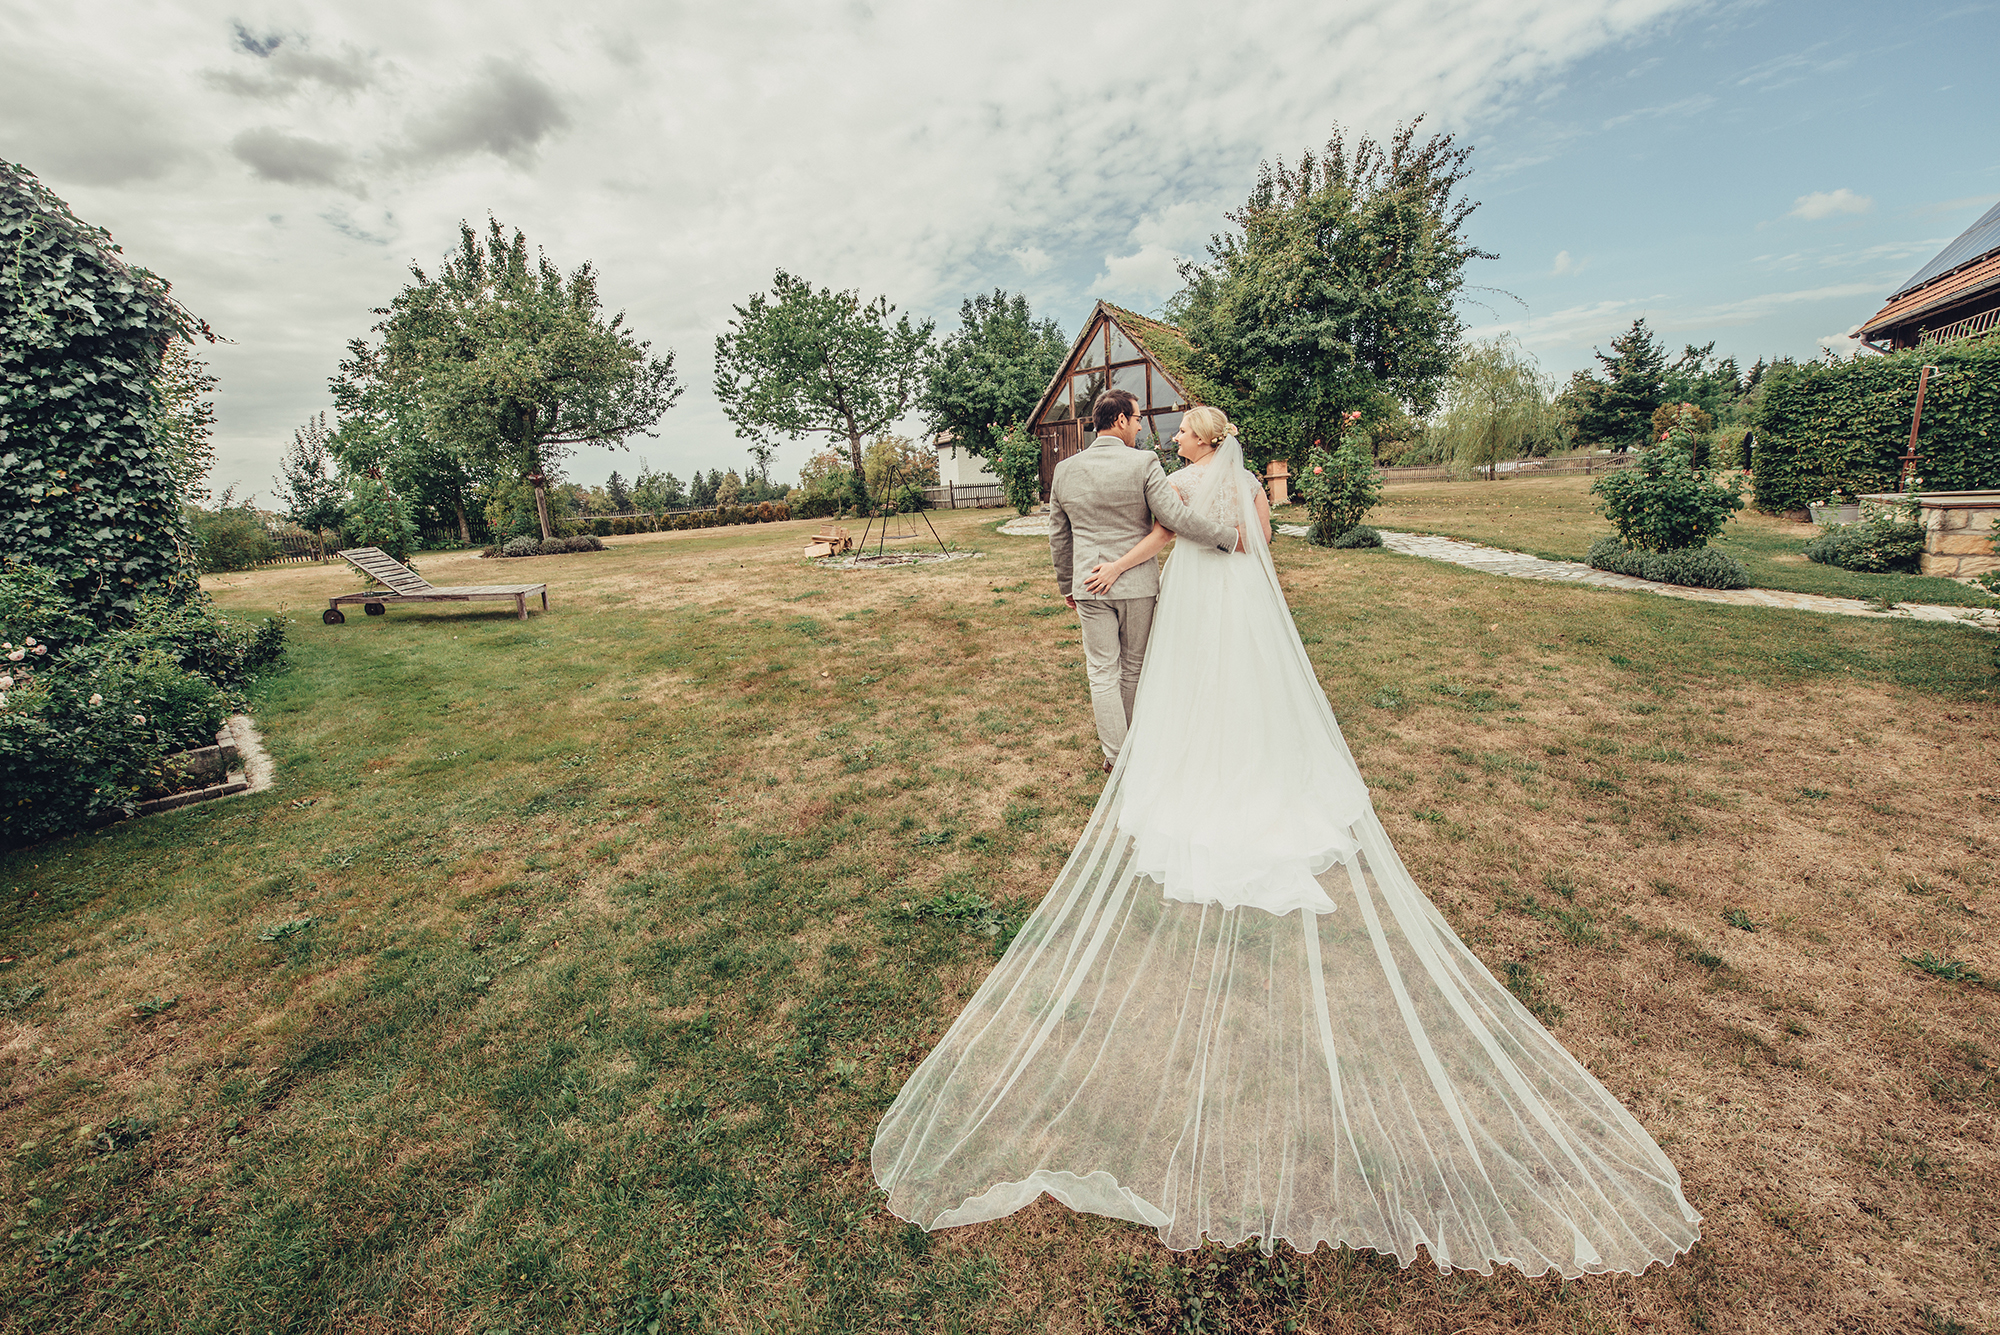 weddingseptemberluminoxx92348234136